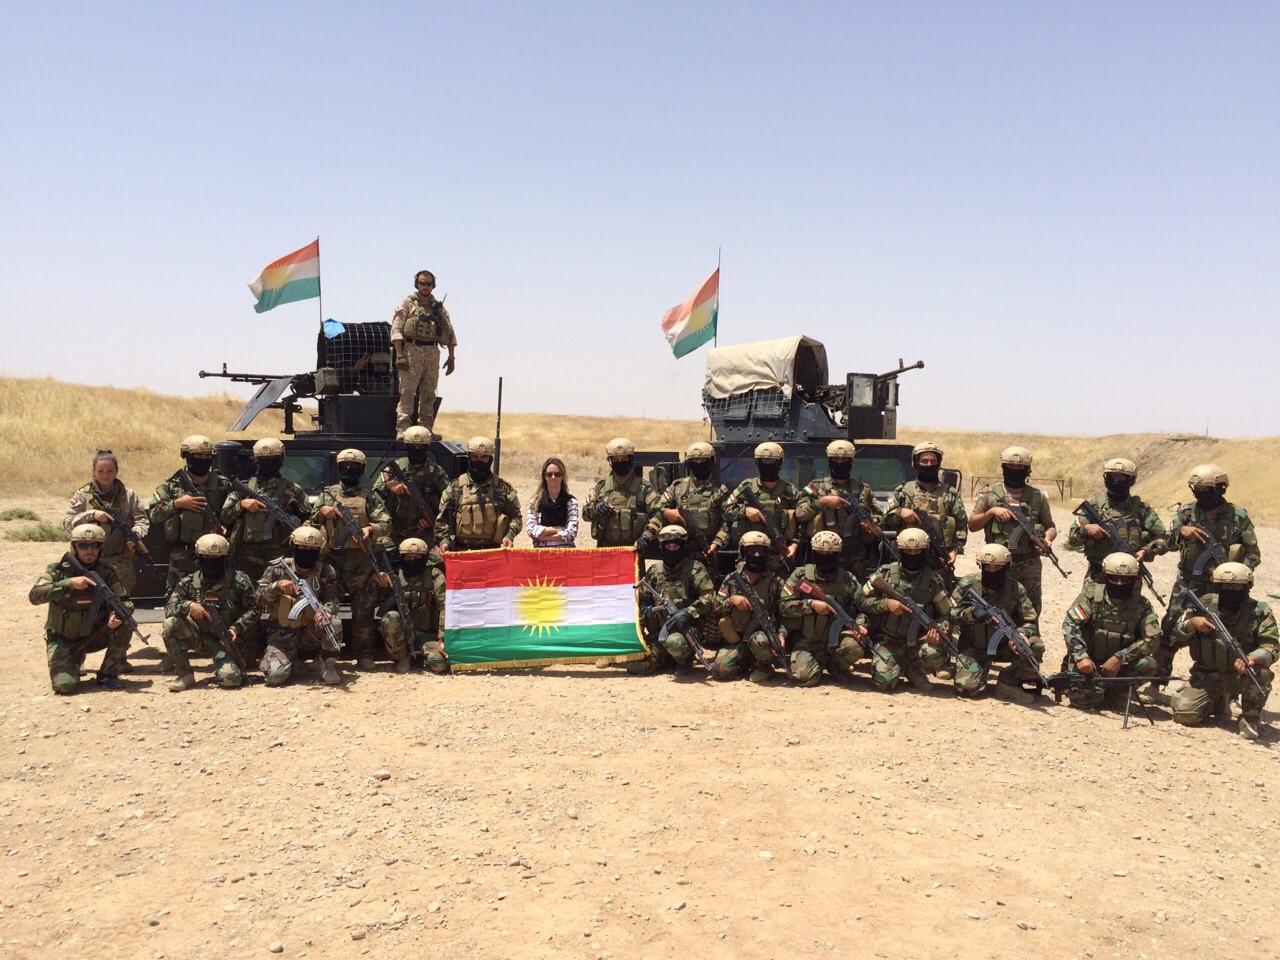 Campo de entrenamiento Peshmerga